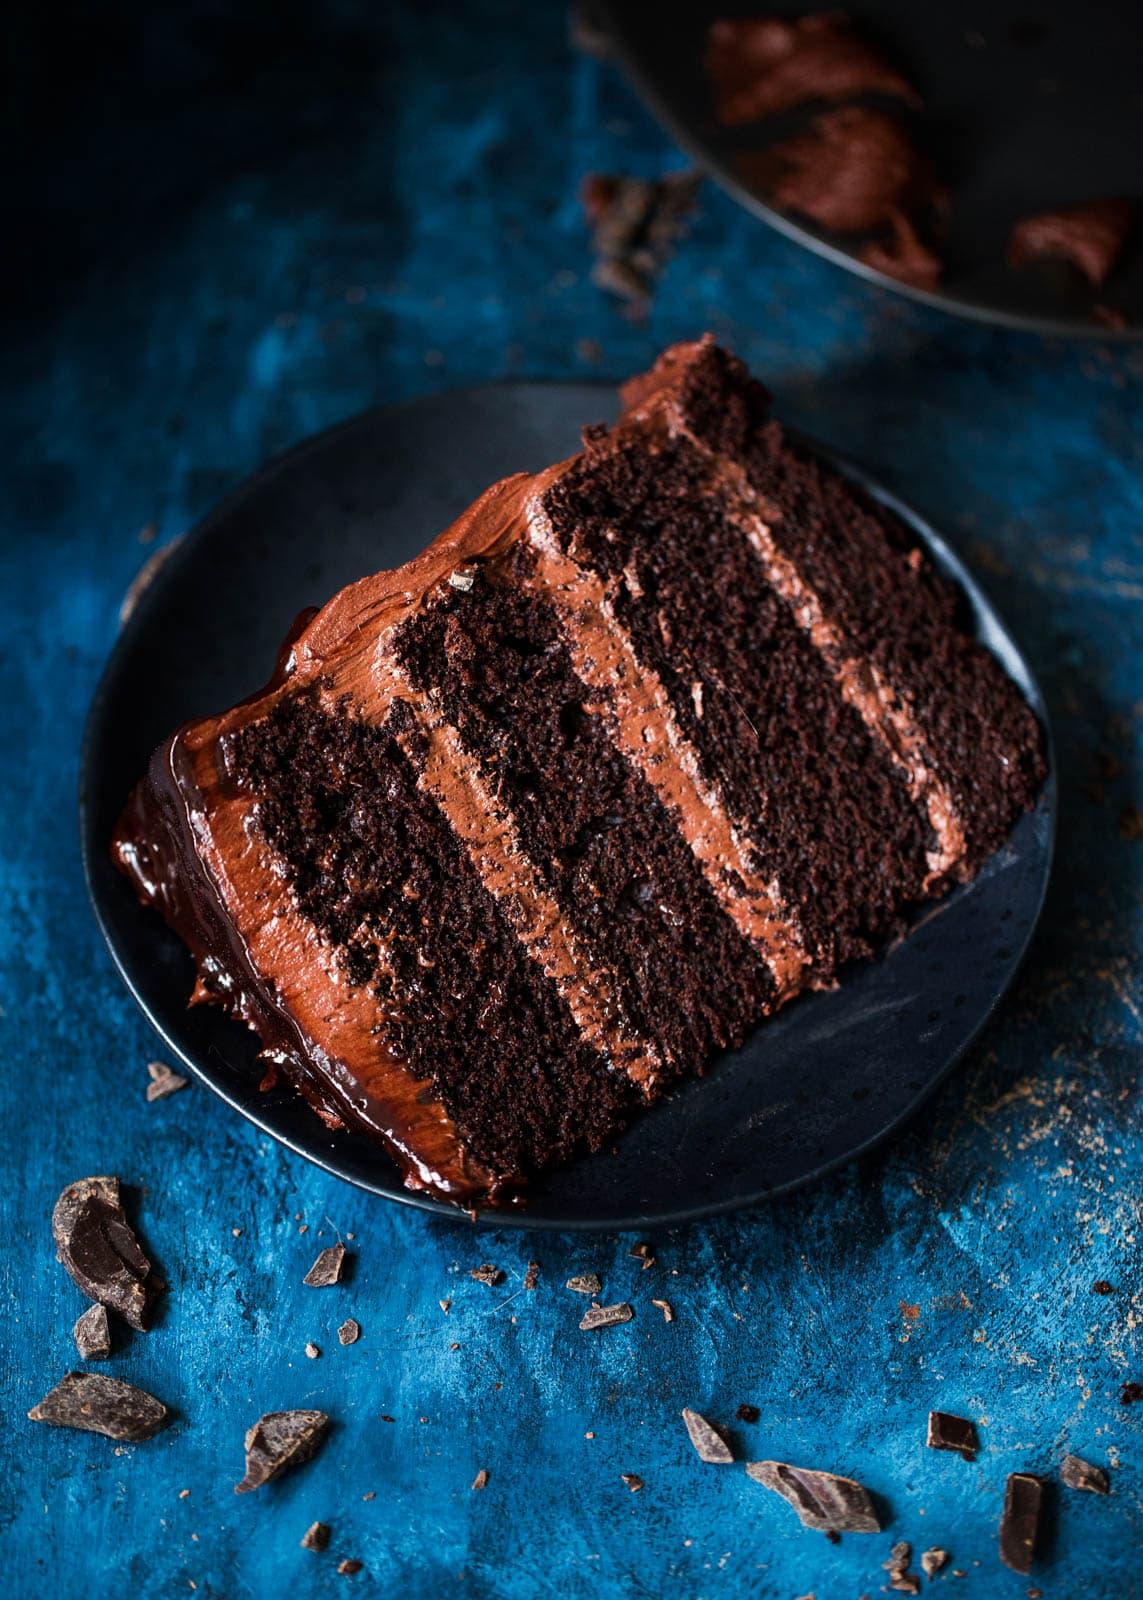 slice of Chocolate Mocha Cake